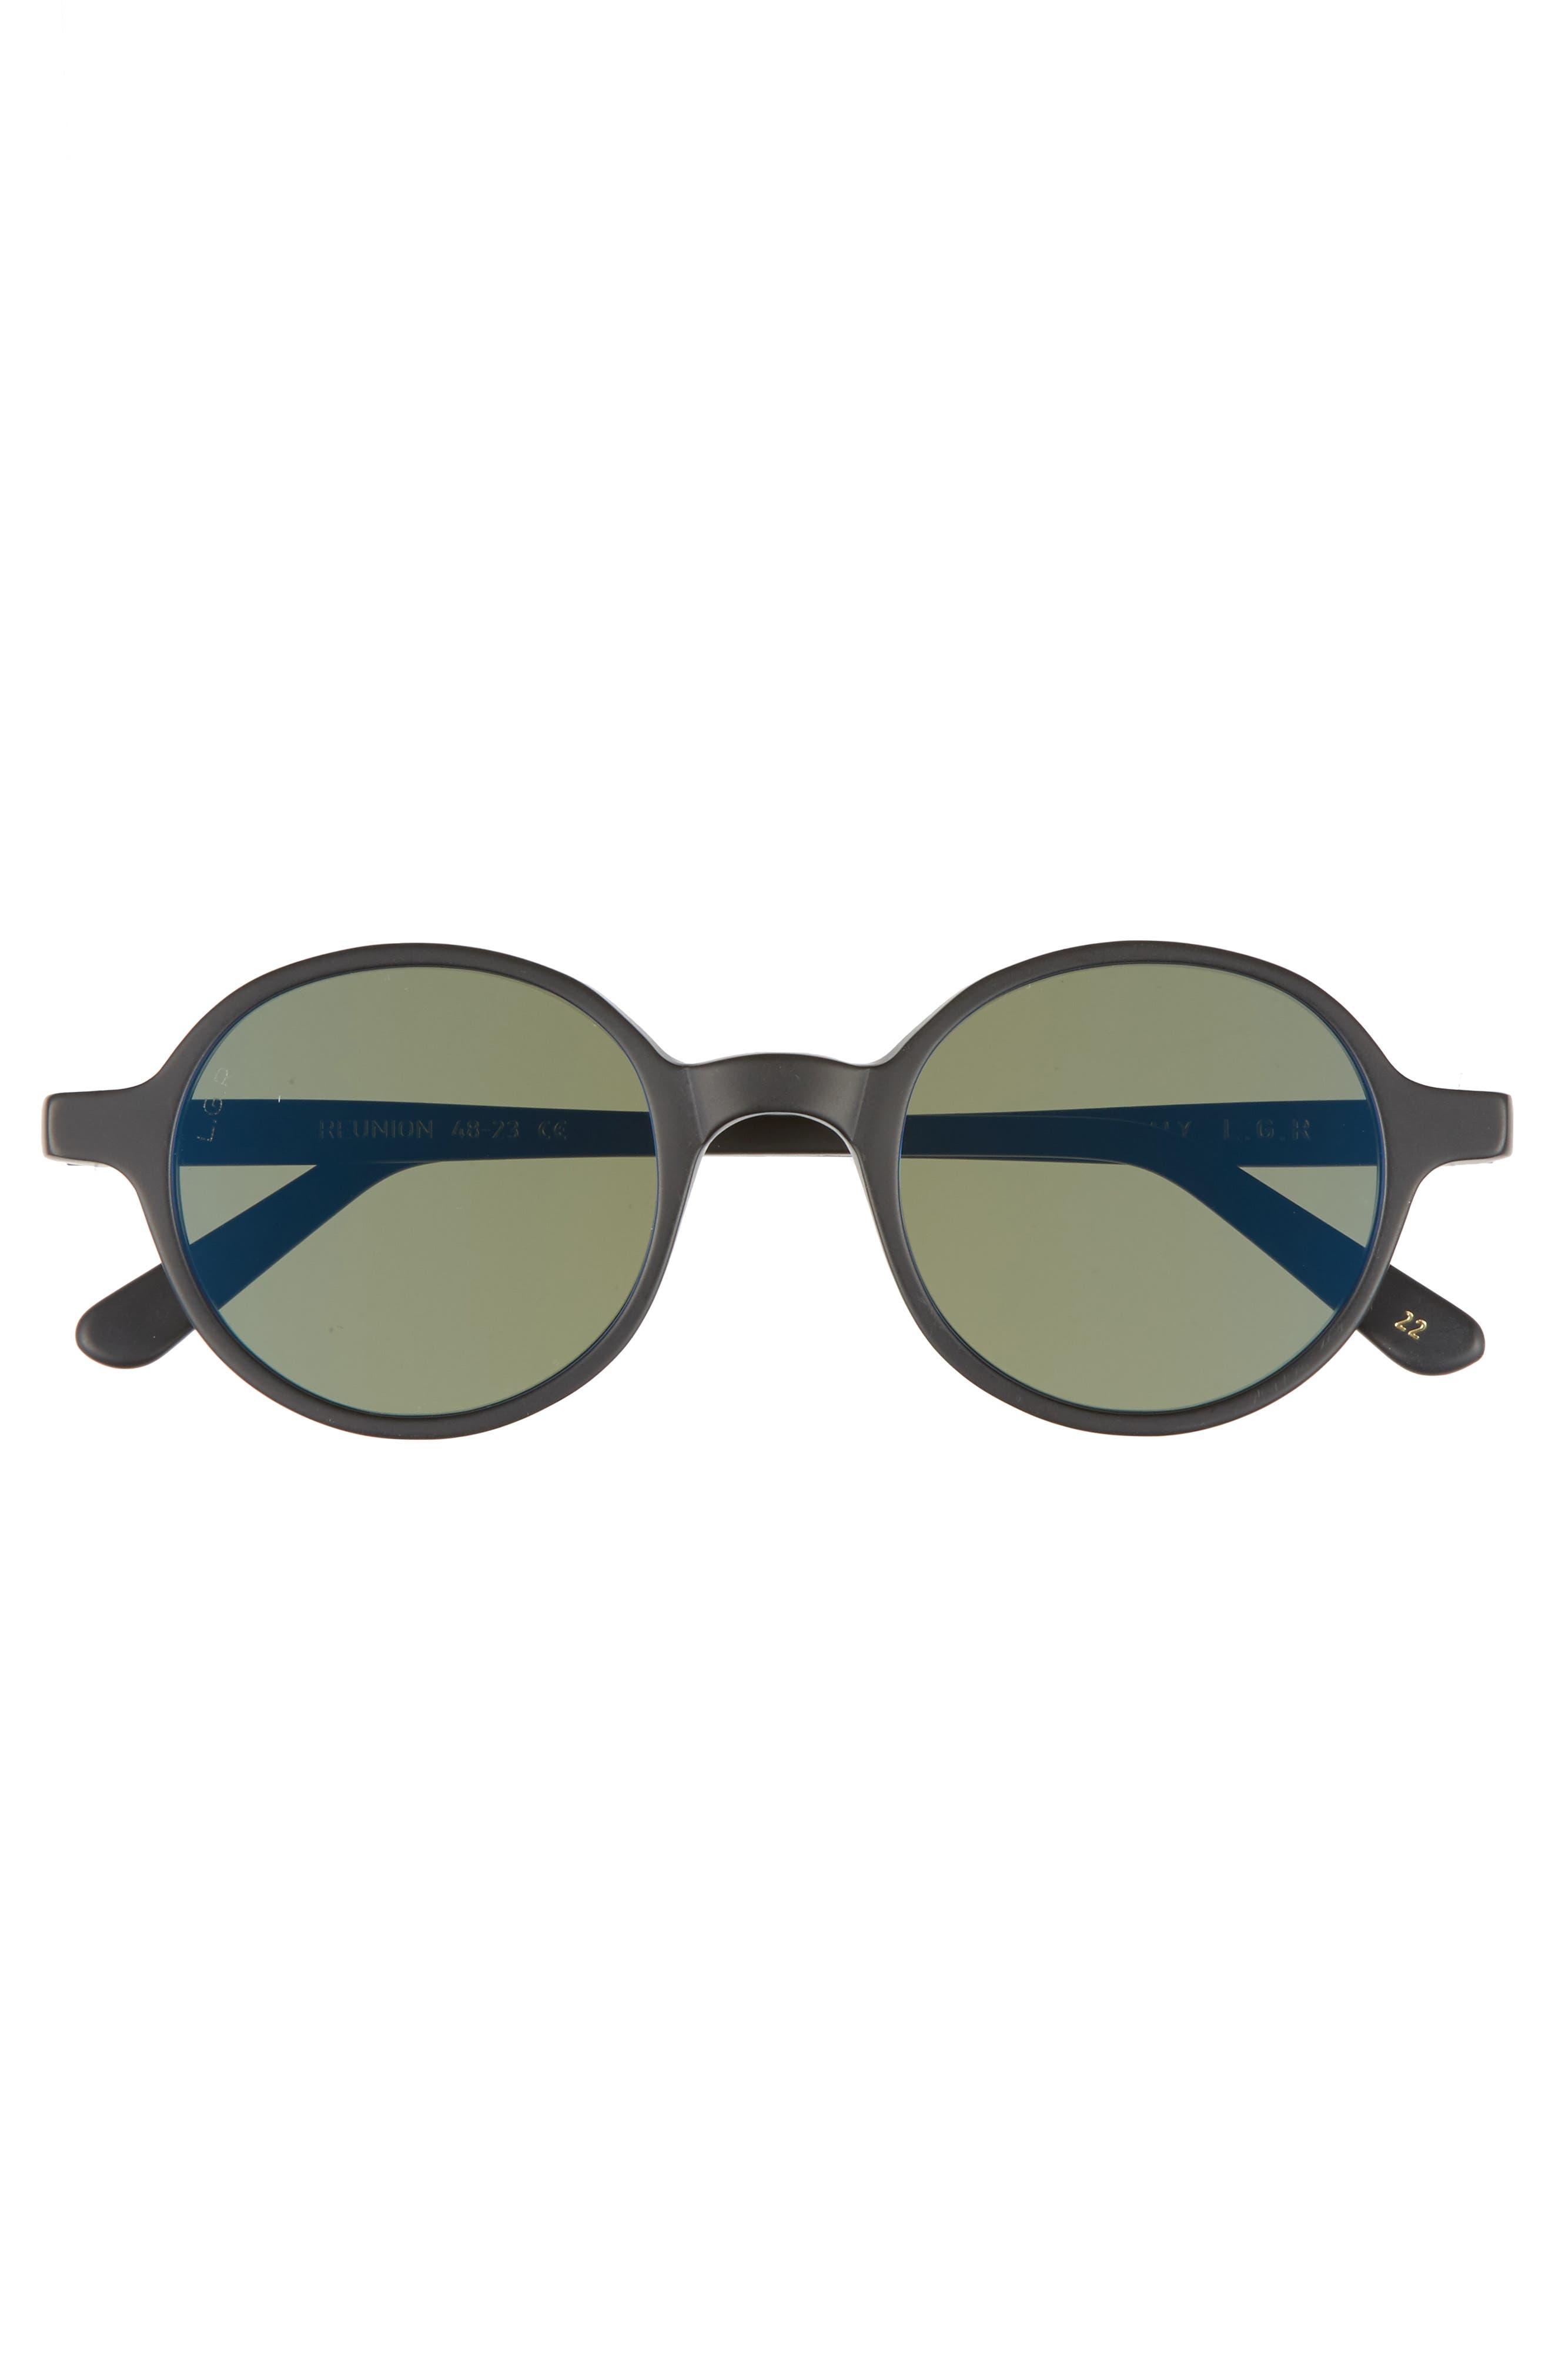 Alternate Image 2  - L.G.R Reunion 48mm Sunglasses